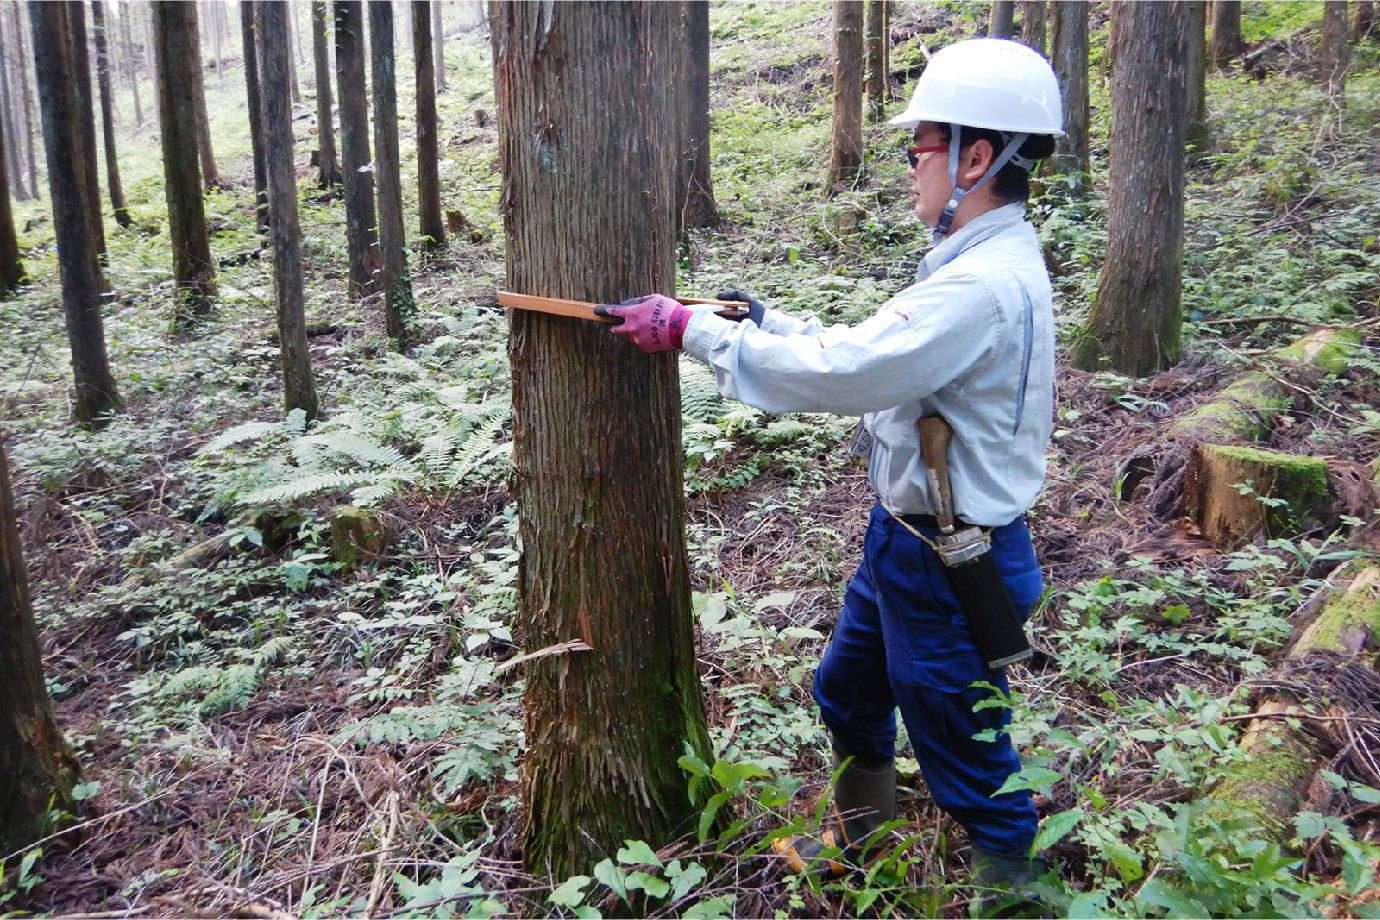 Iさんが森林の調査をしている写真